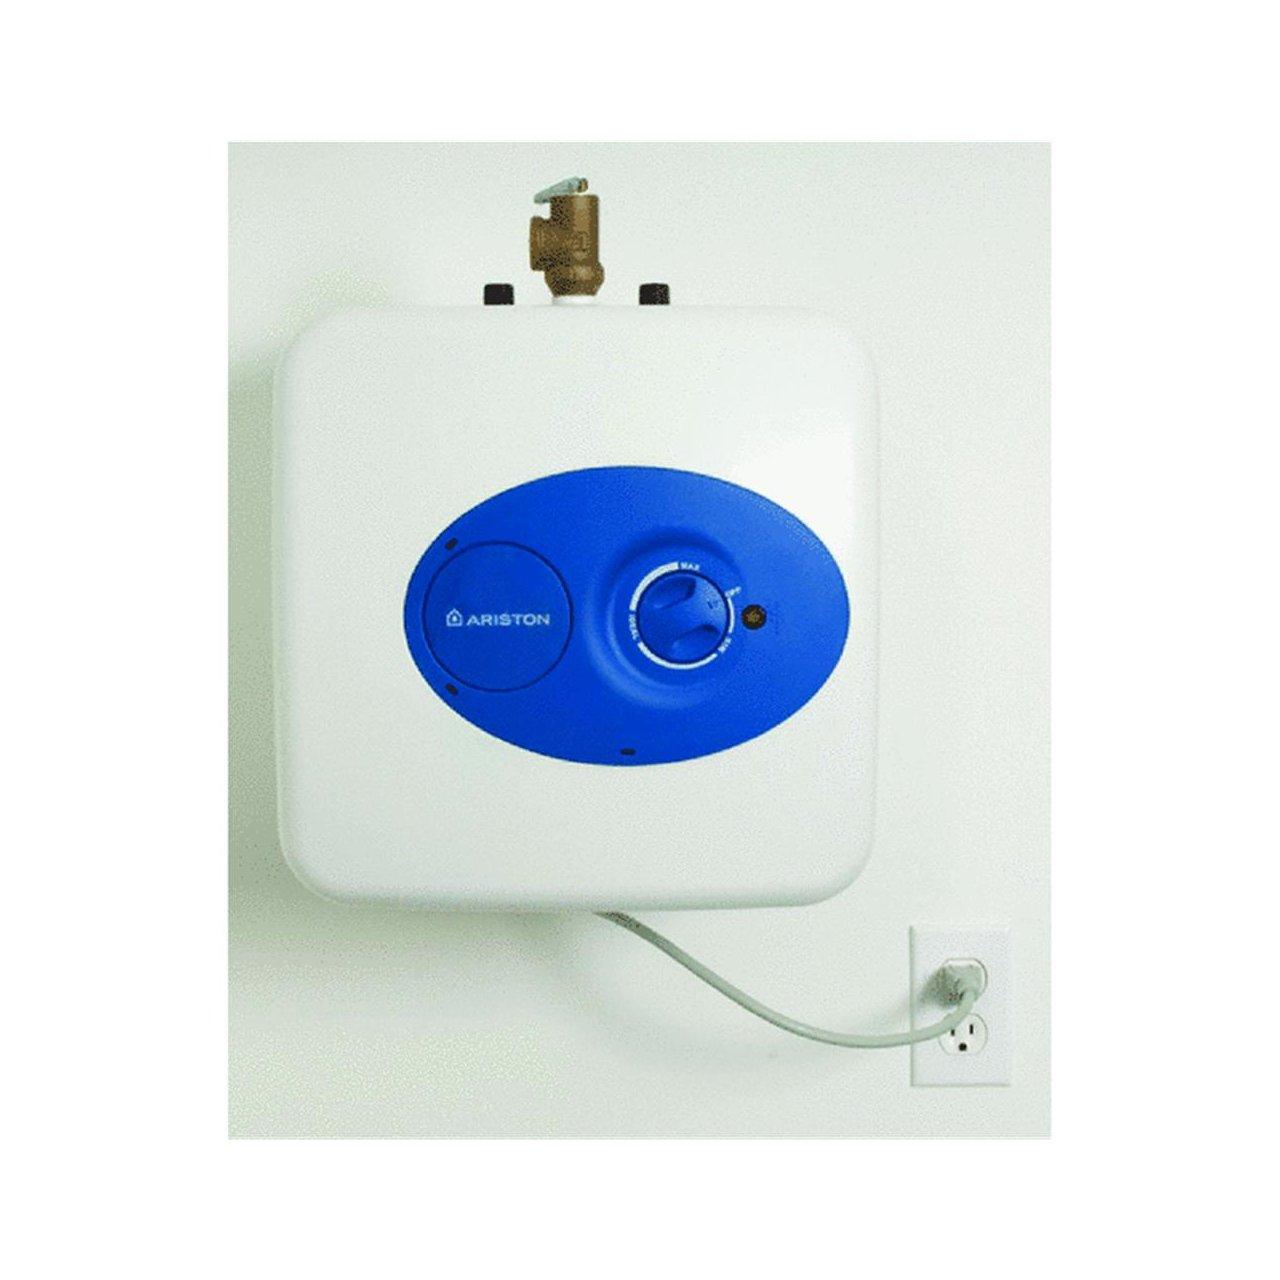 Ariston Gl4s Electric Mini Tank Water Heater Pou How To Wire